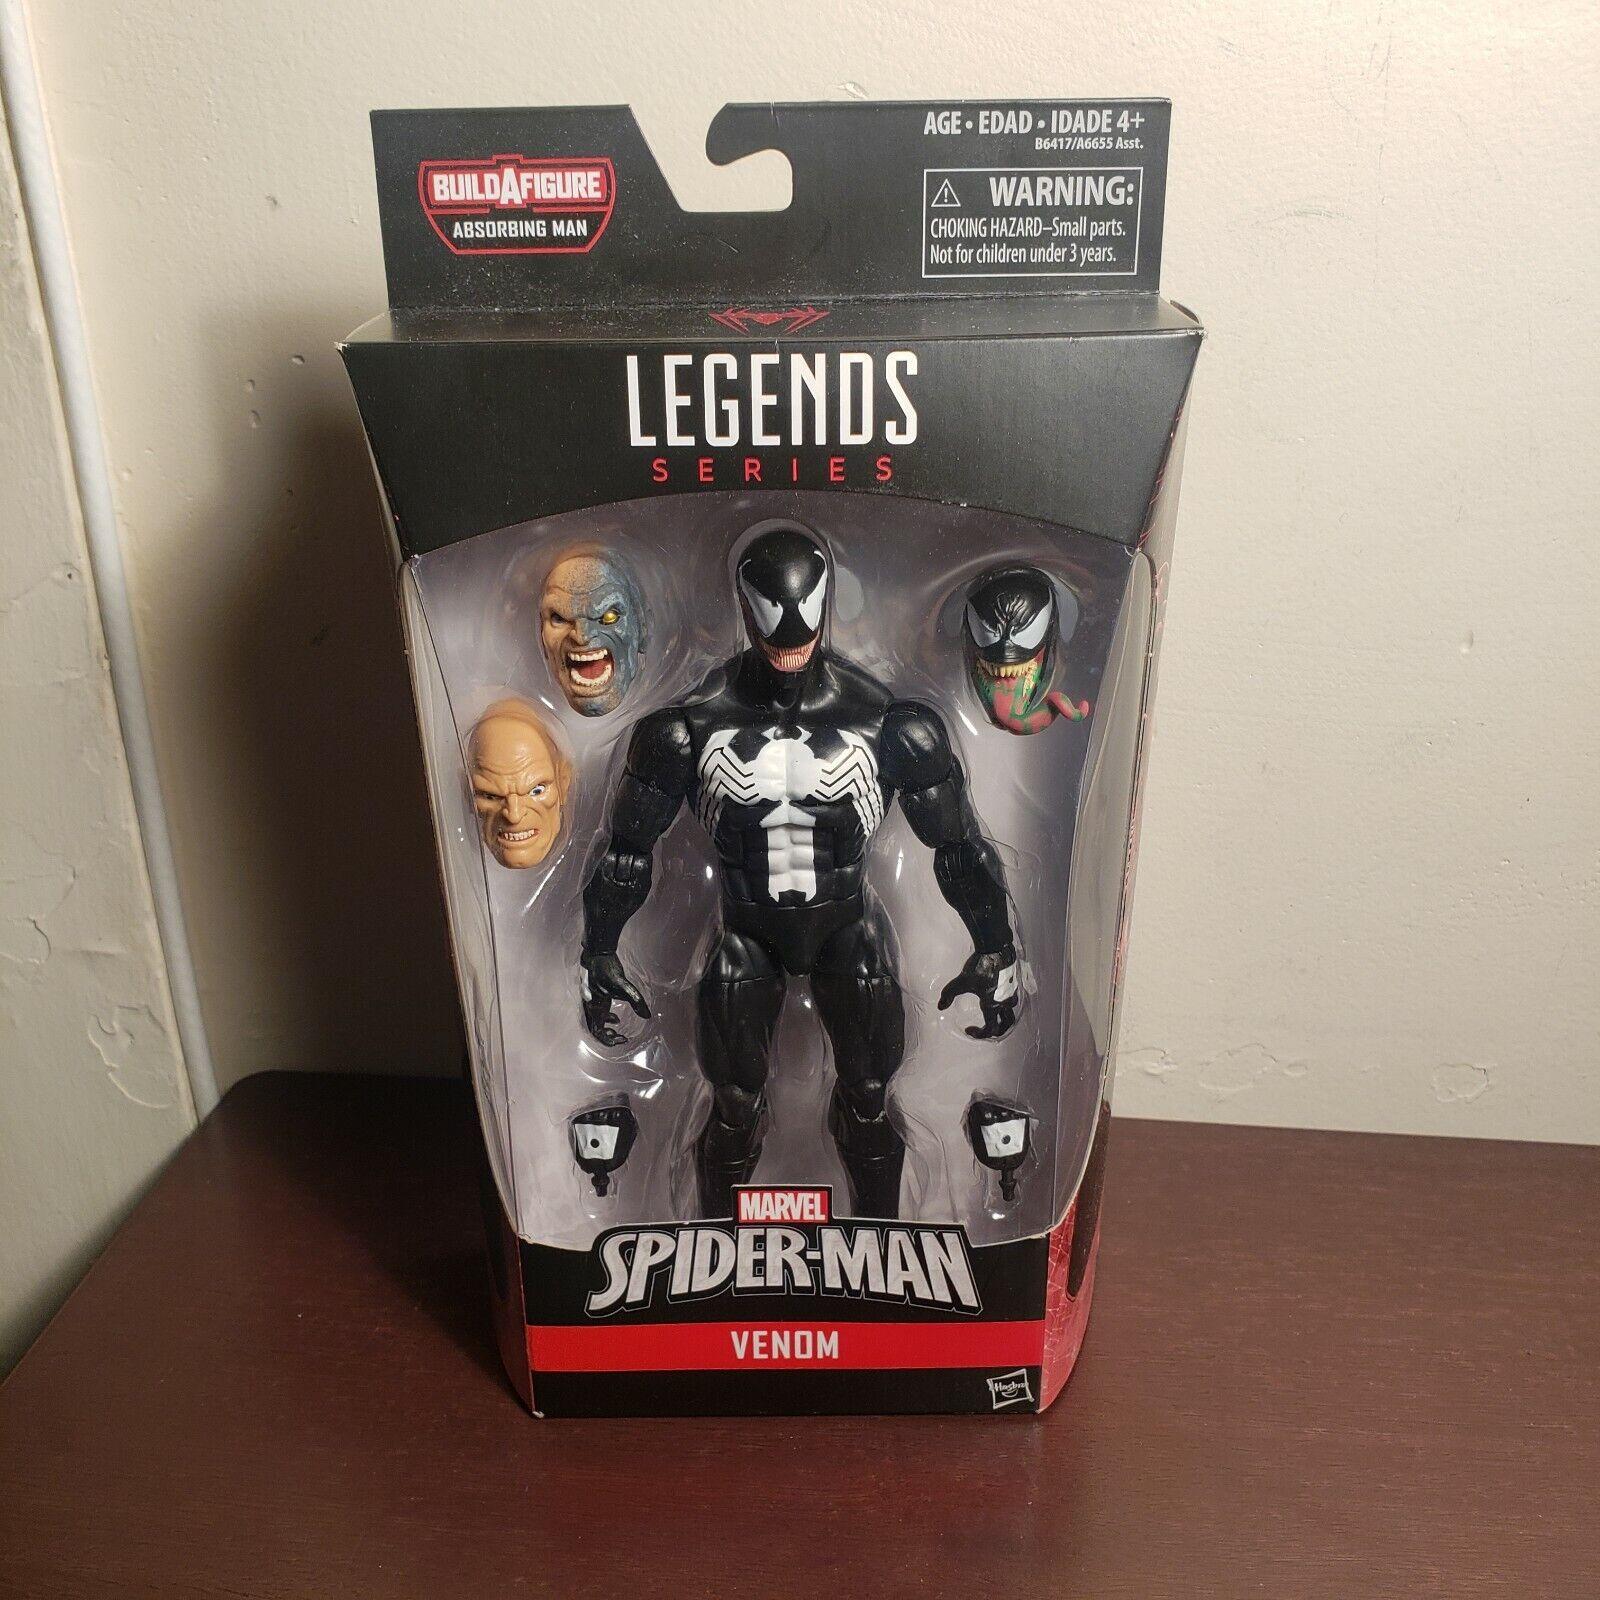 Marvel Legends - VENOM Action Figure - Spider-Man Infinite  - HASBRO  100% garantie d'ajustement